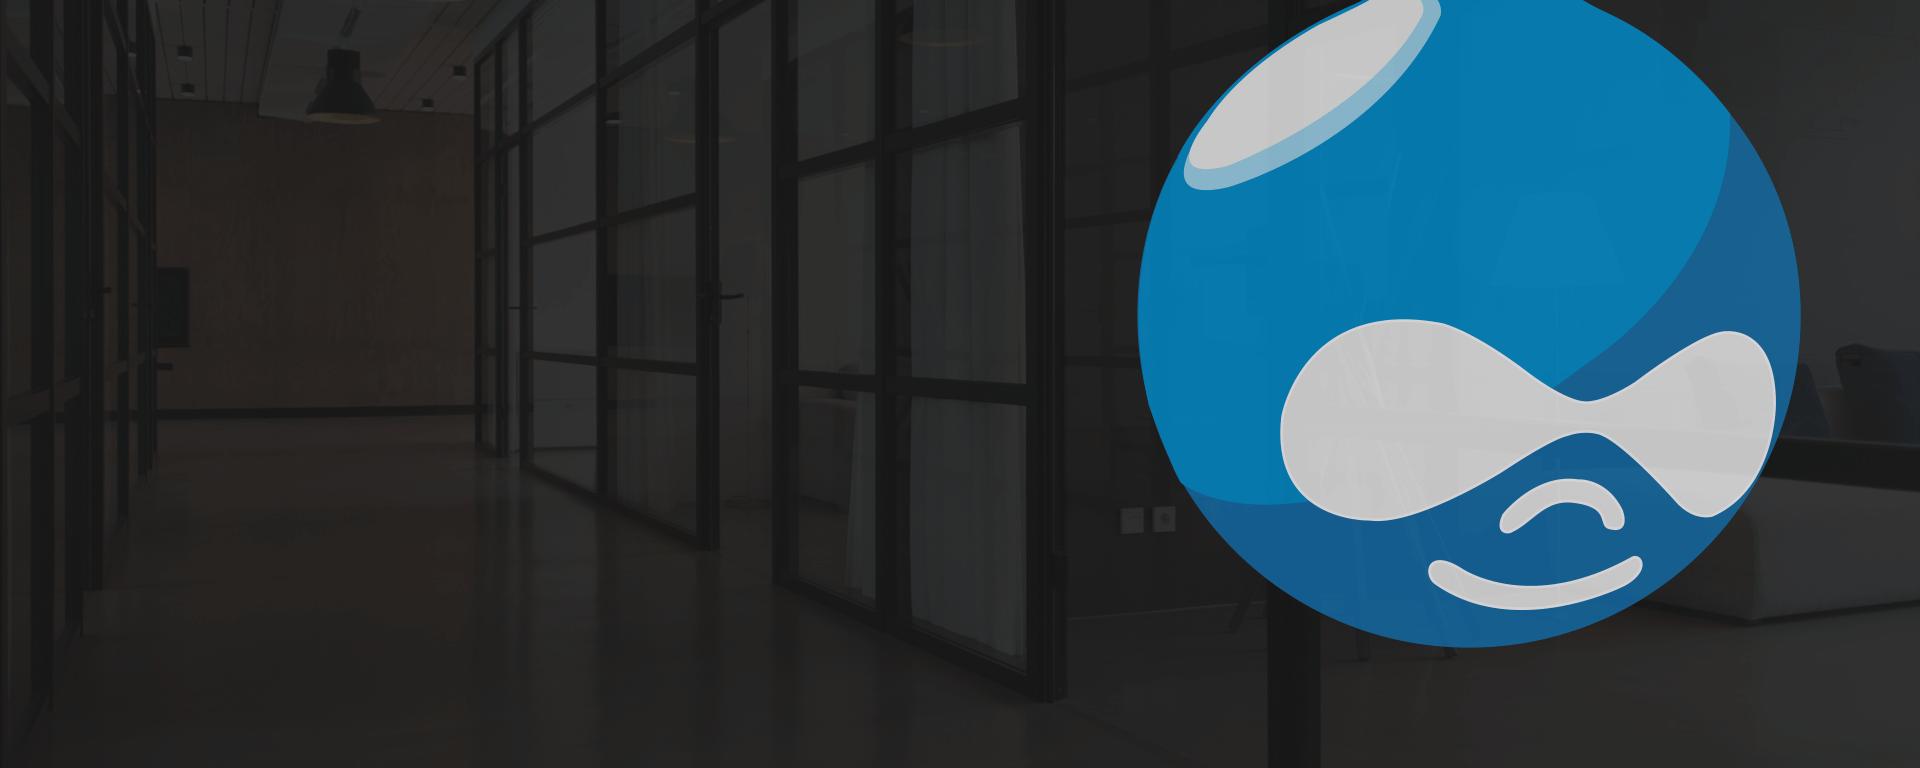 Reliable Drupal Development Company